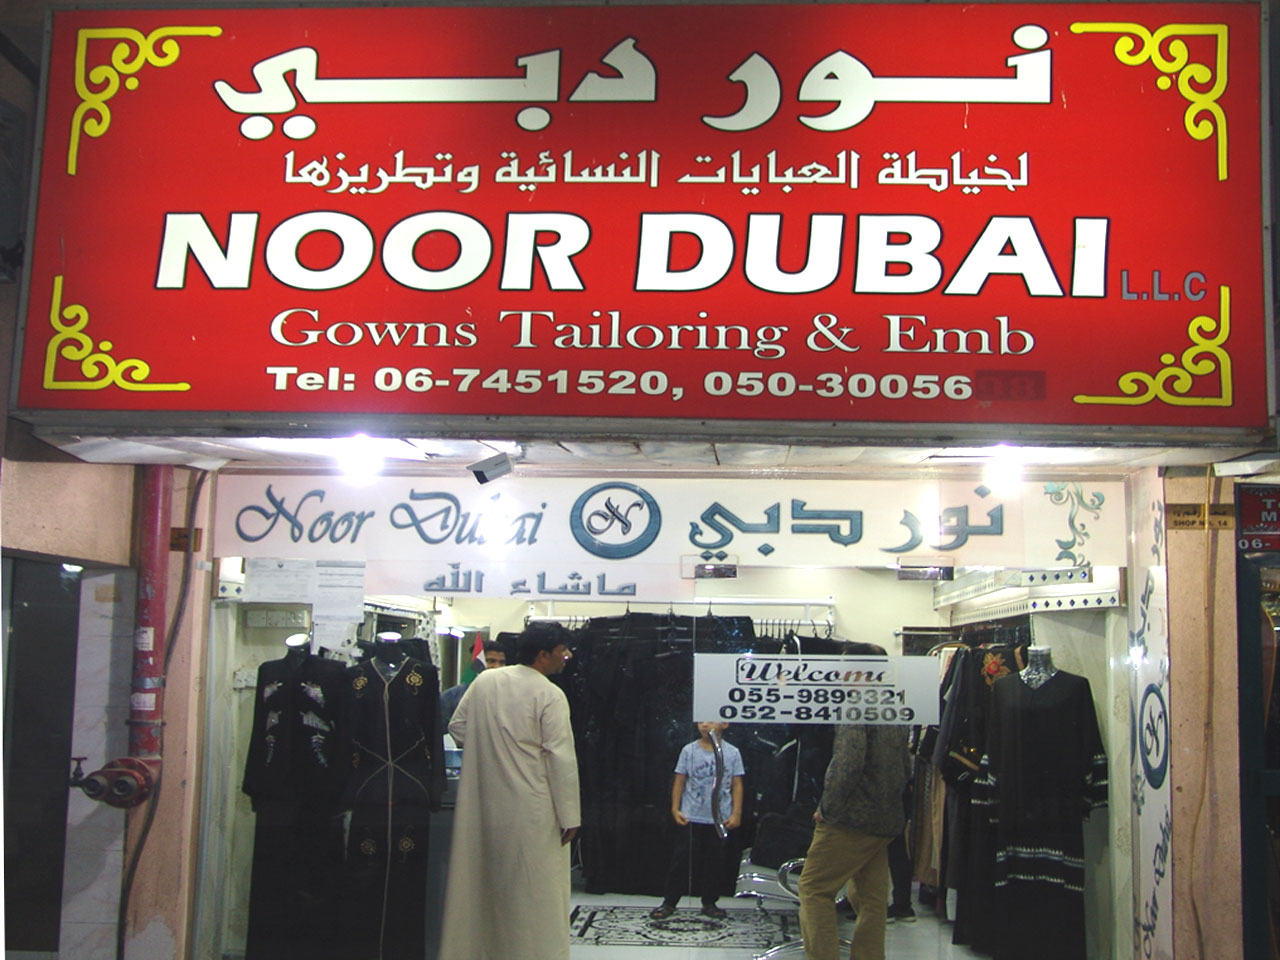 Noor Dubai Abaya Tailoring & Embroidery    - 1.jpg